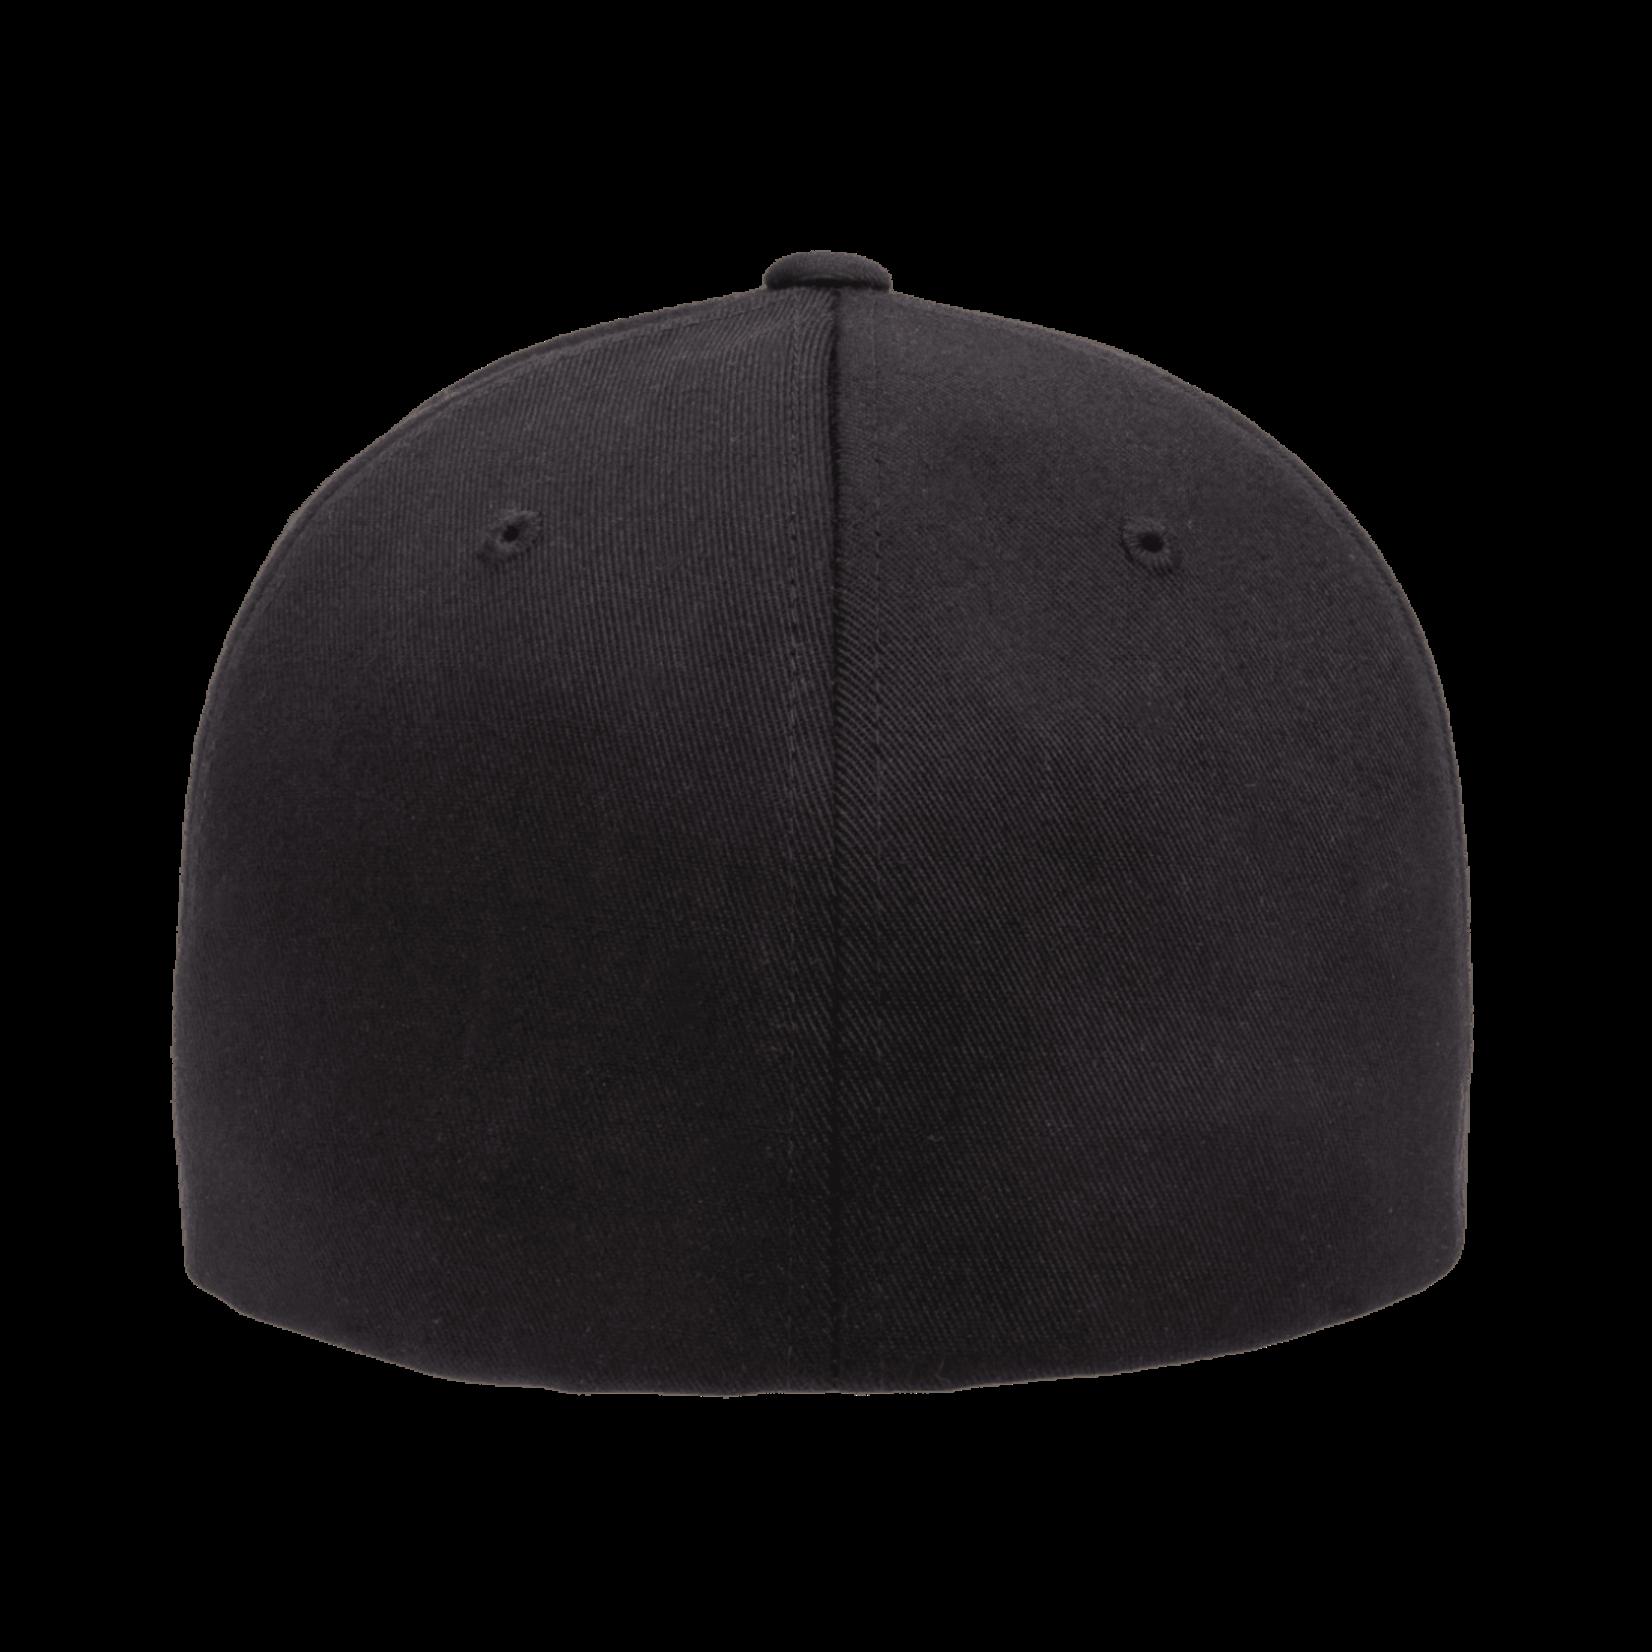 Flexfit Flexfit 6277 Classic Ballcap - Black